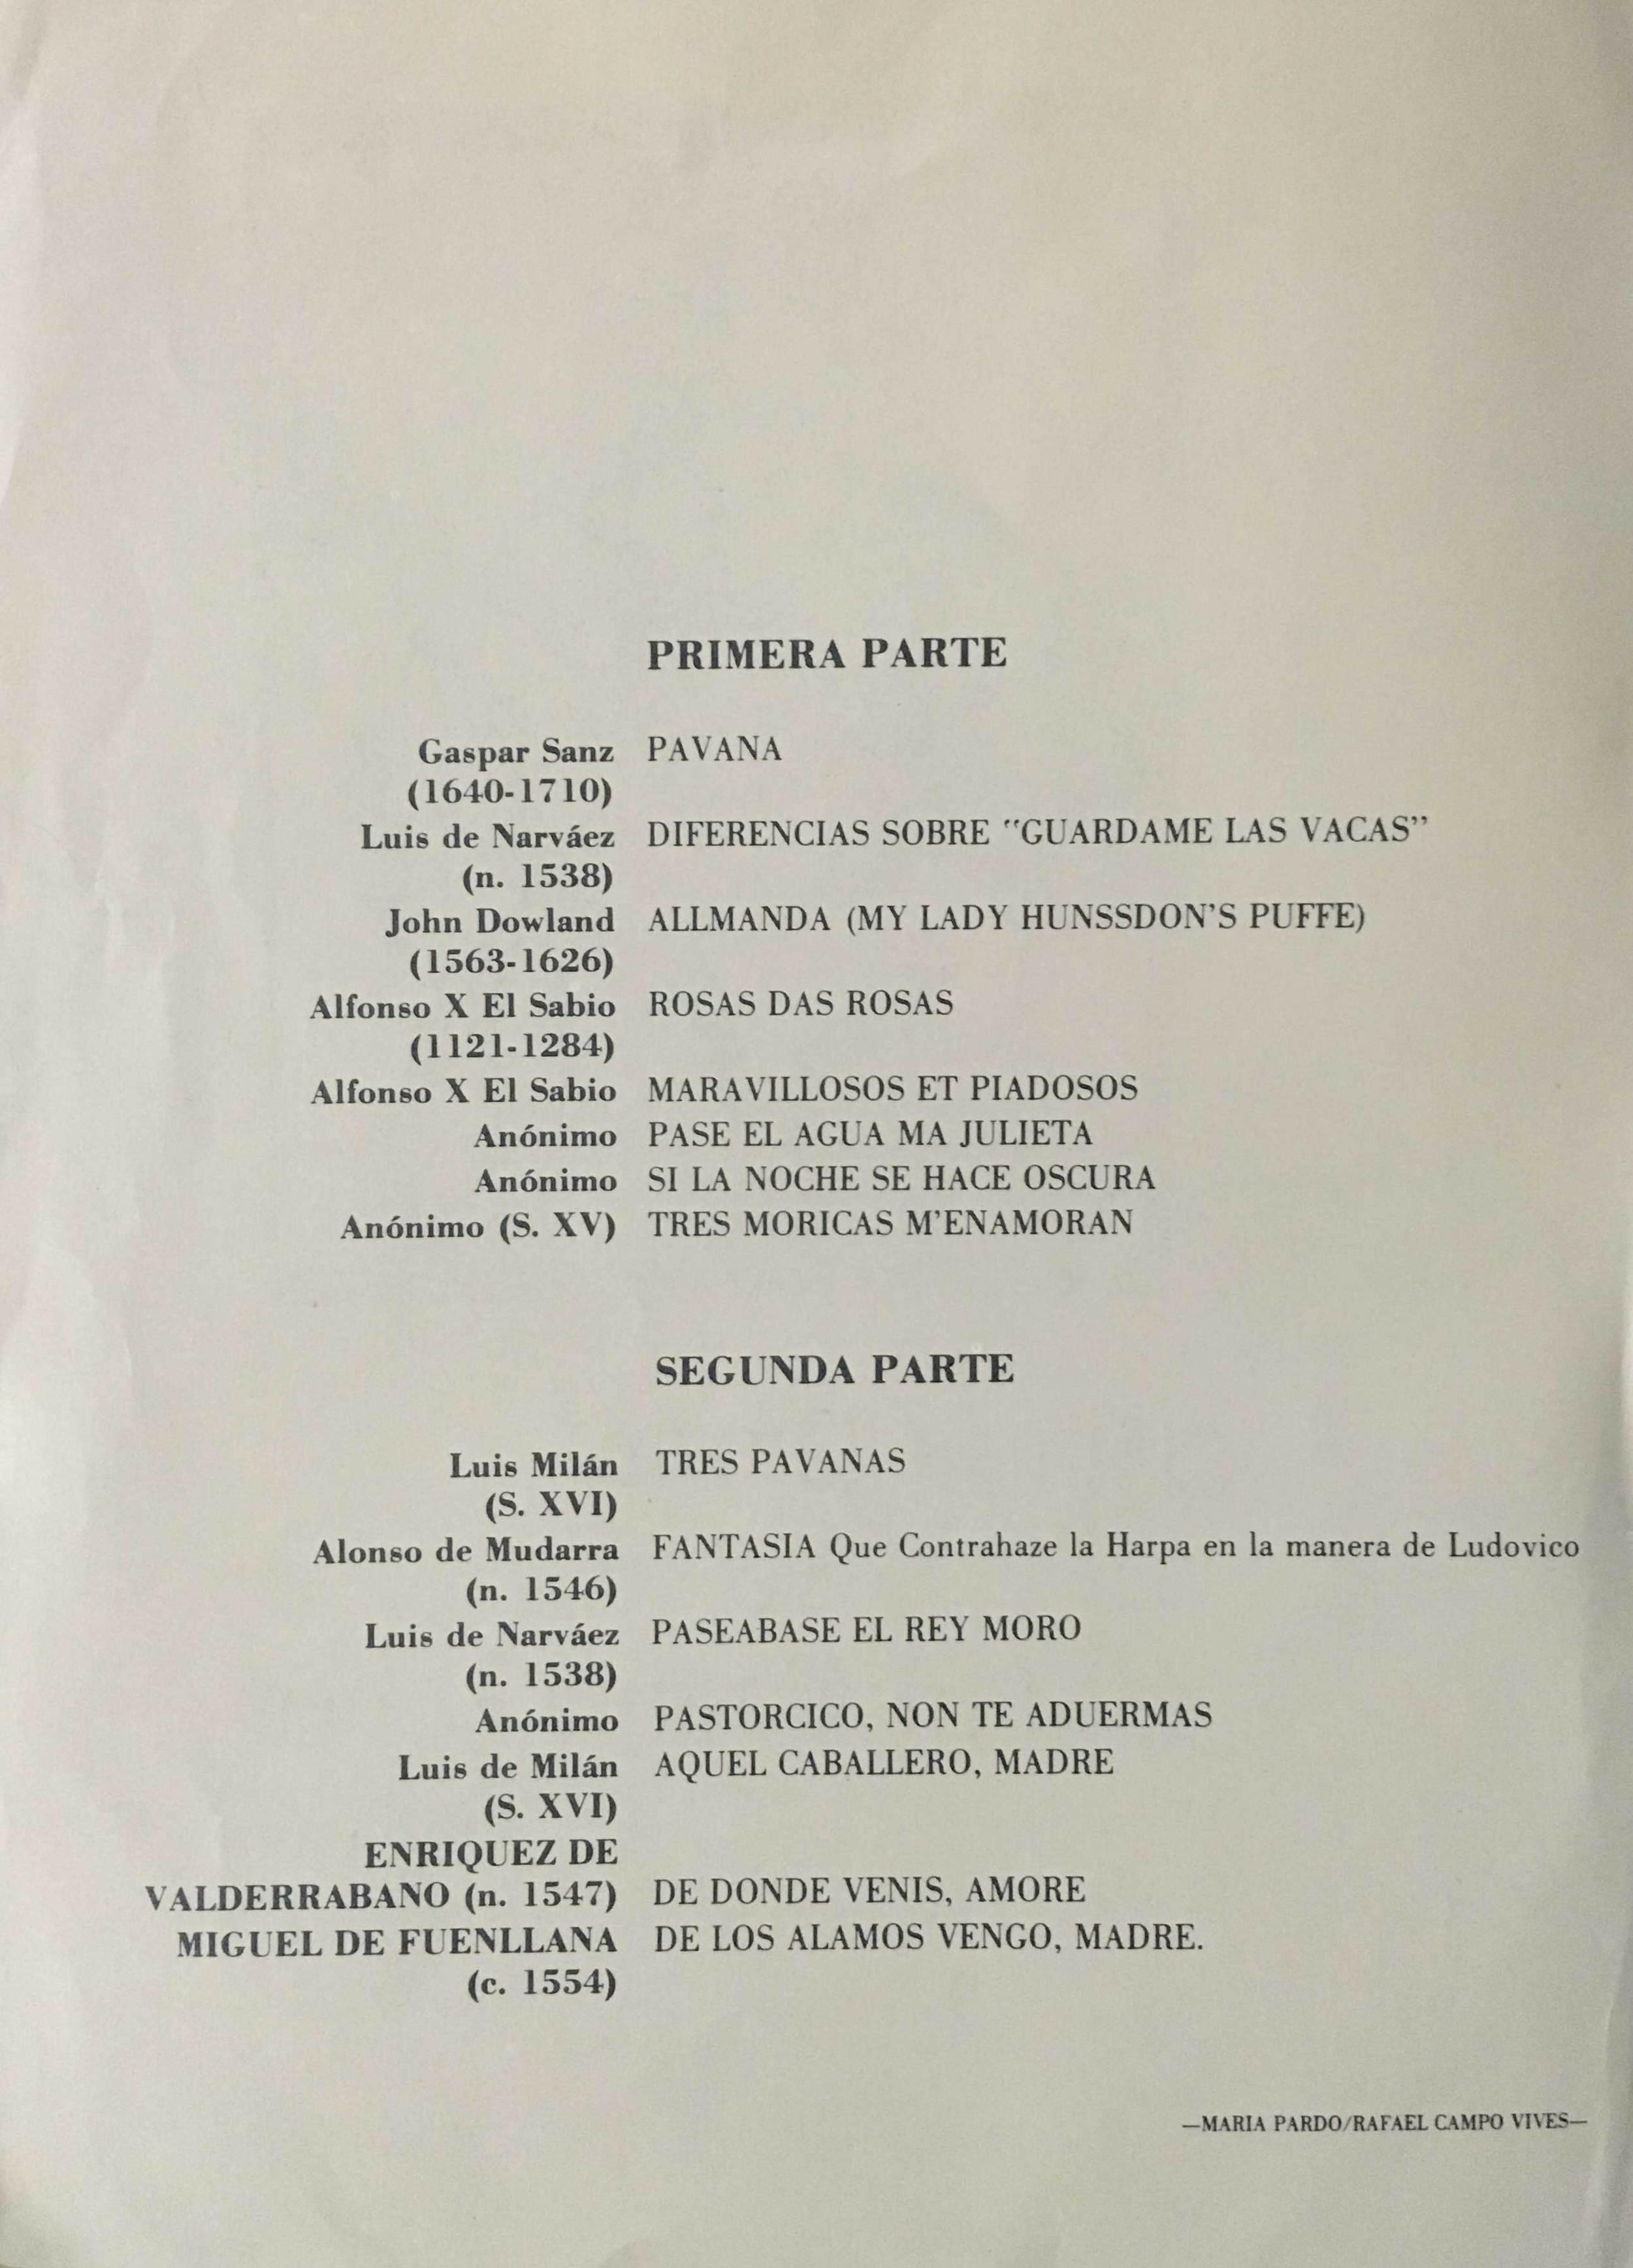 musica_medieval_y_renacentista_3.JPG